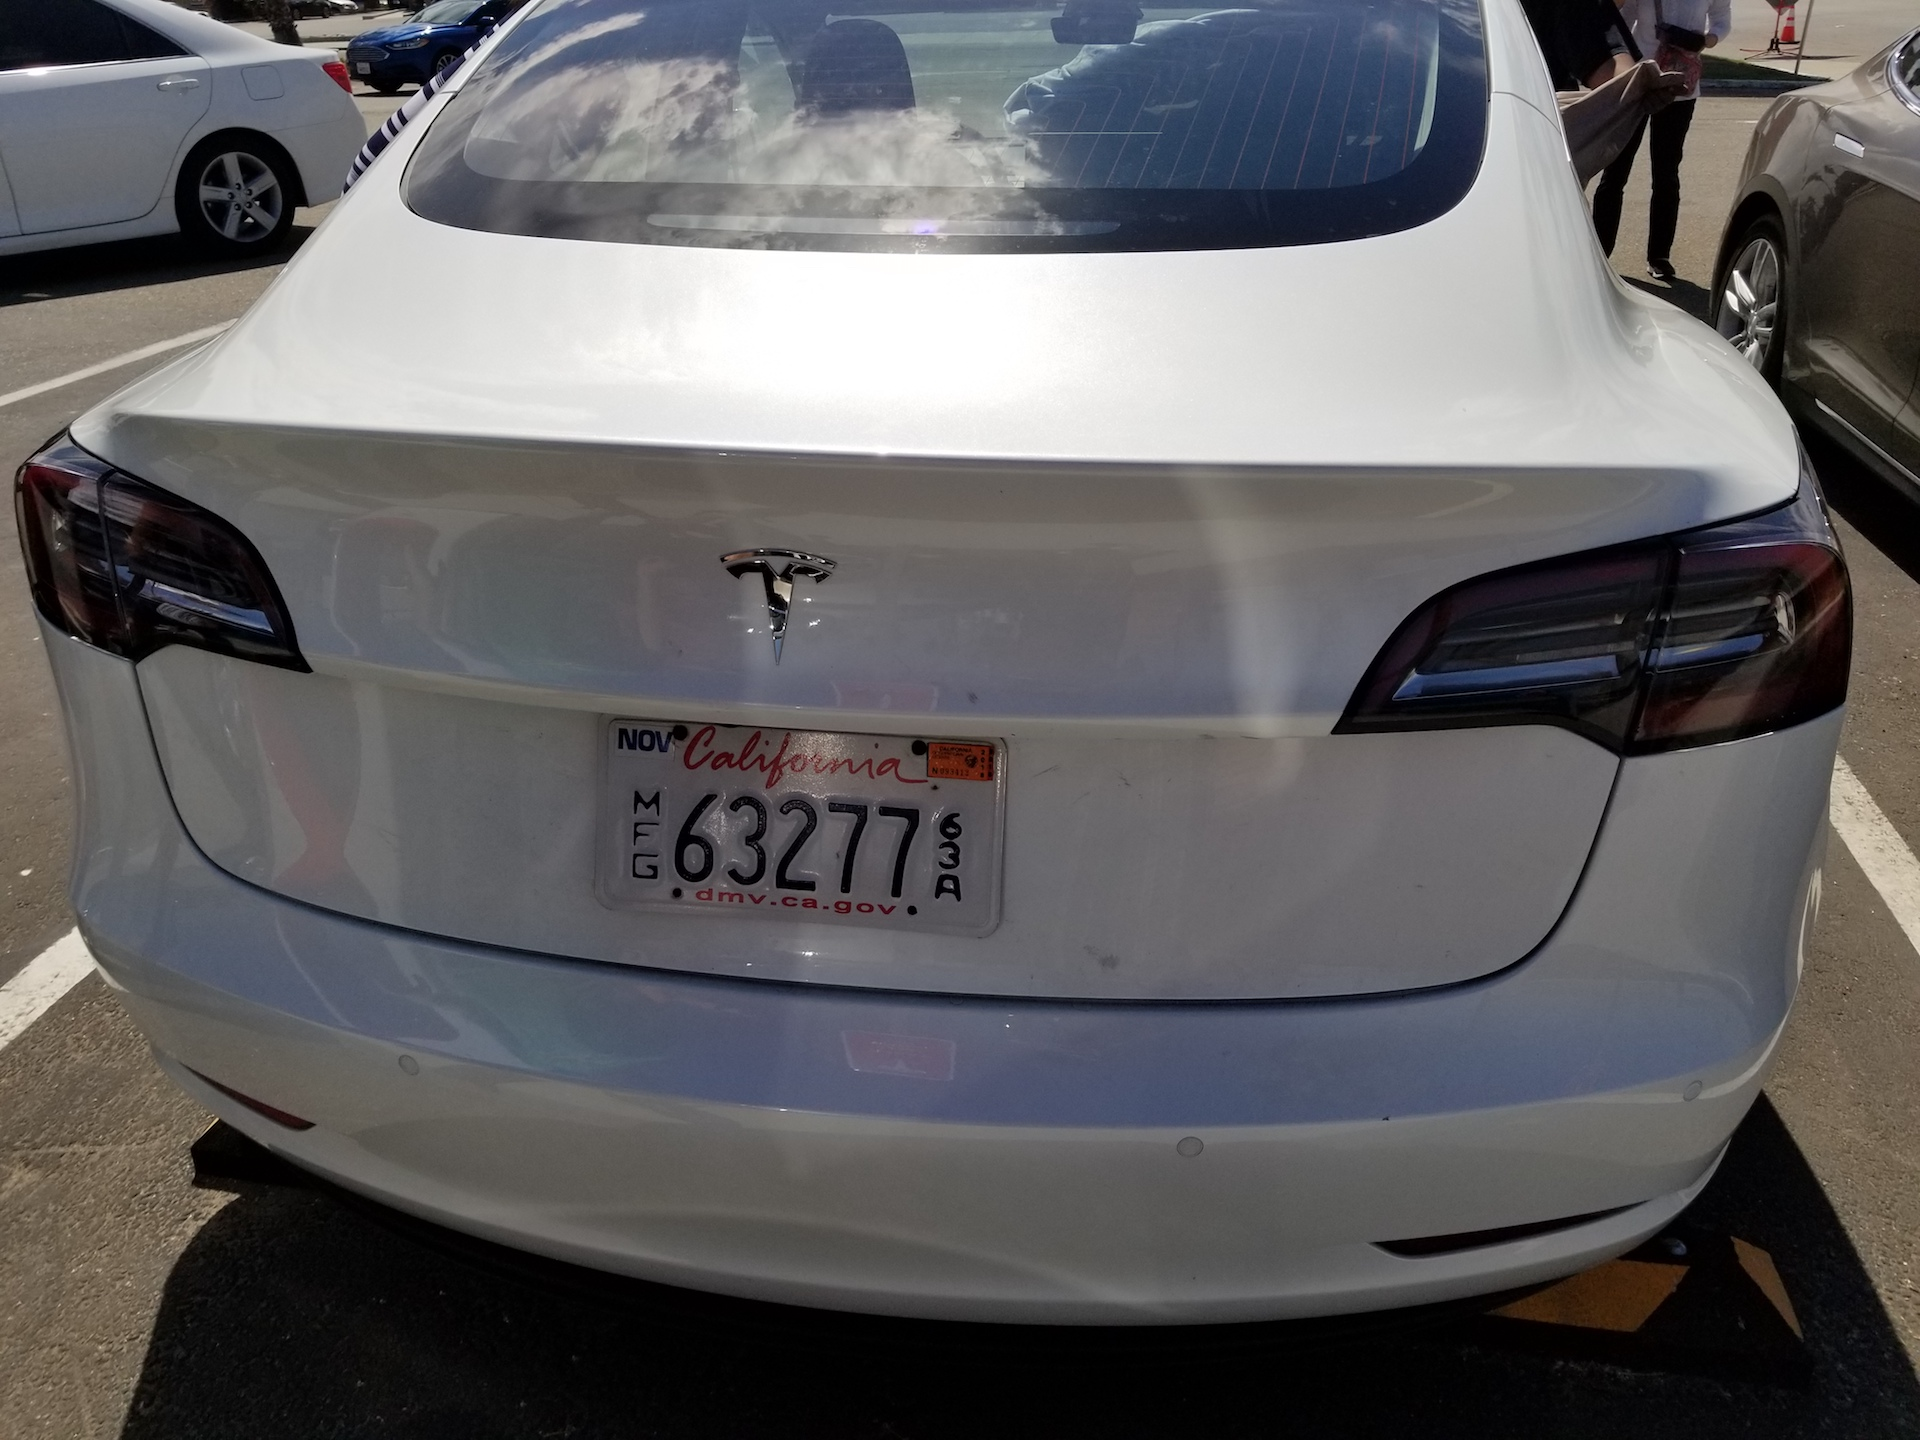 White Tesla Model 3 Trunk Bakersfield Sighting TESLARATI